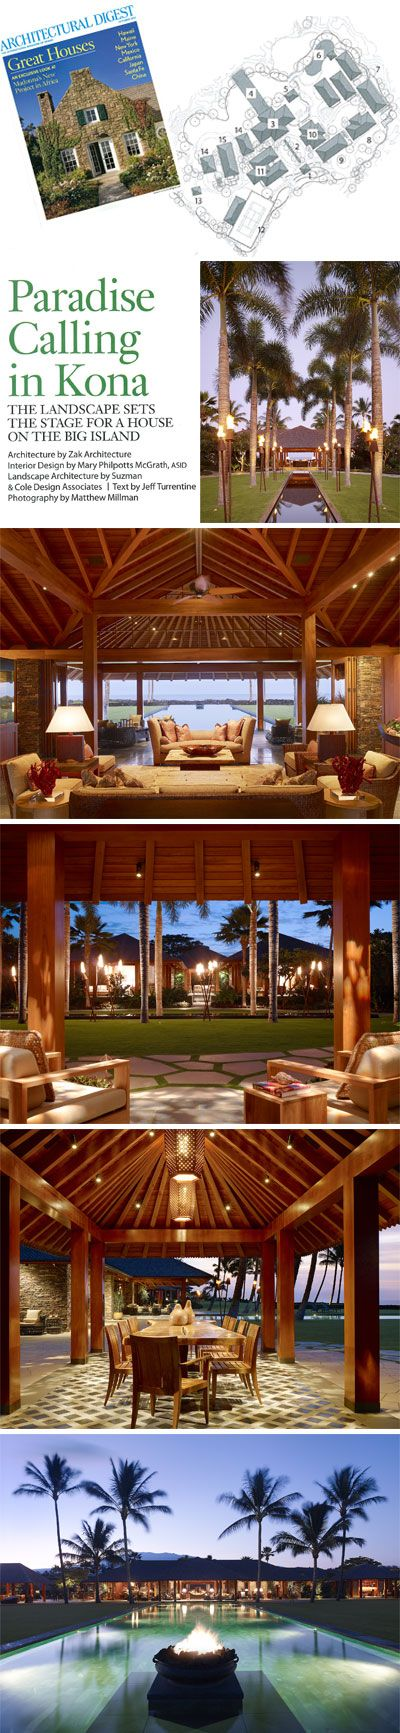 Press: Architectural Digest - Paradise Calling in Kona   Philpotts Interiors   Hawaii Interior Design Firm   Honolulu - San Francisco.  Architecture by Zak Architecture Interior Design by Mary Philpotts McGrath, ASID Landscape Architecture by Suzman & Cole Design Associates